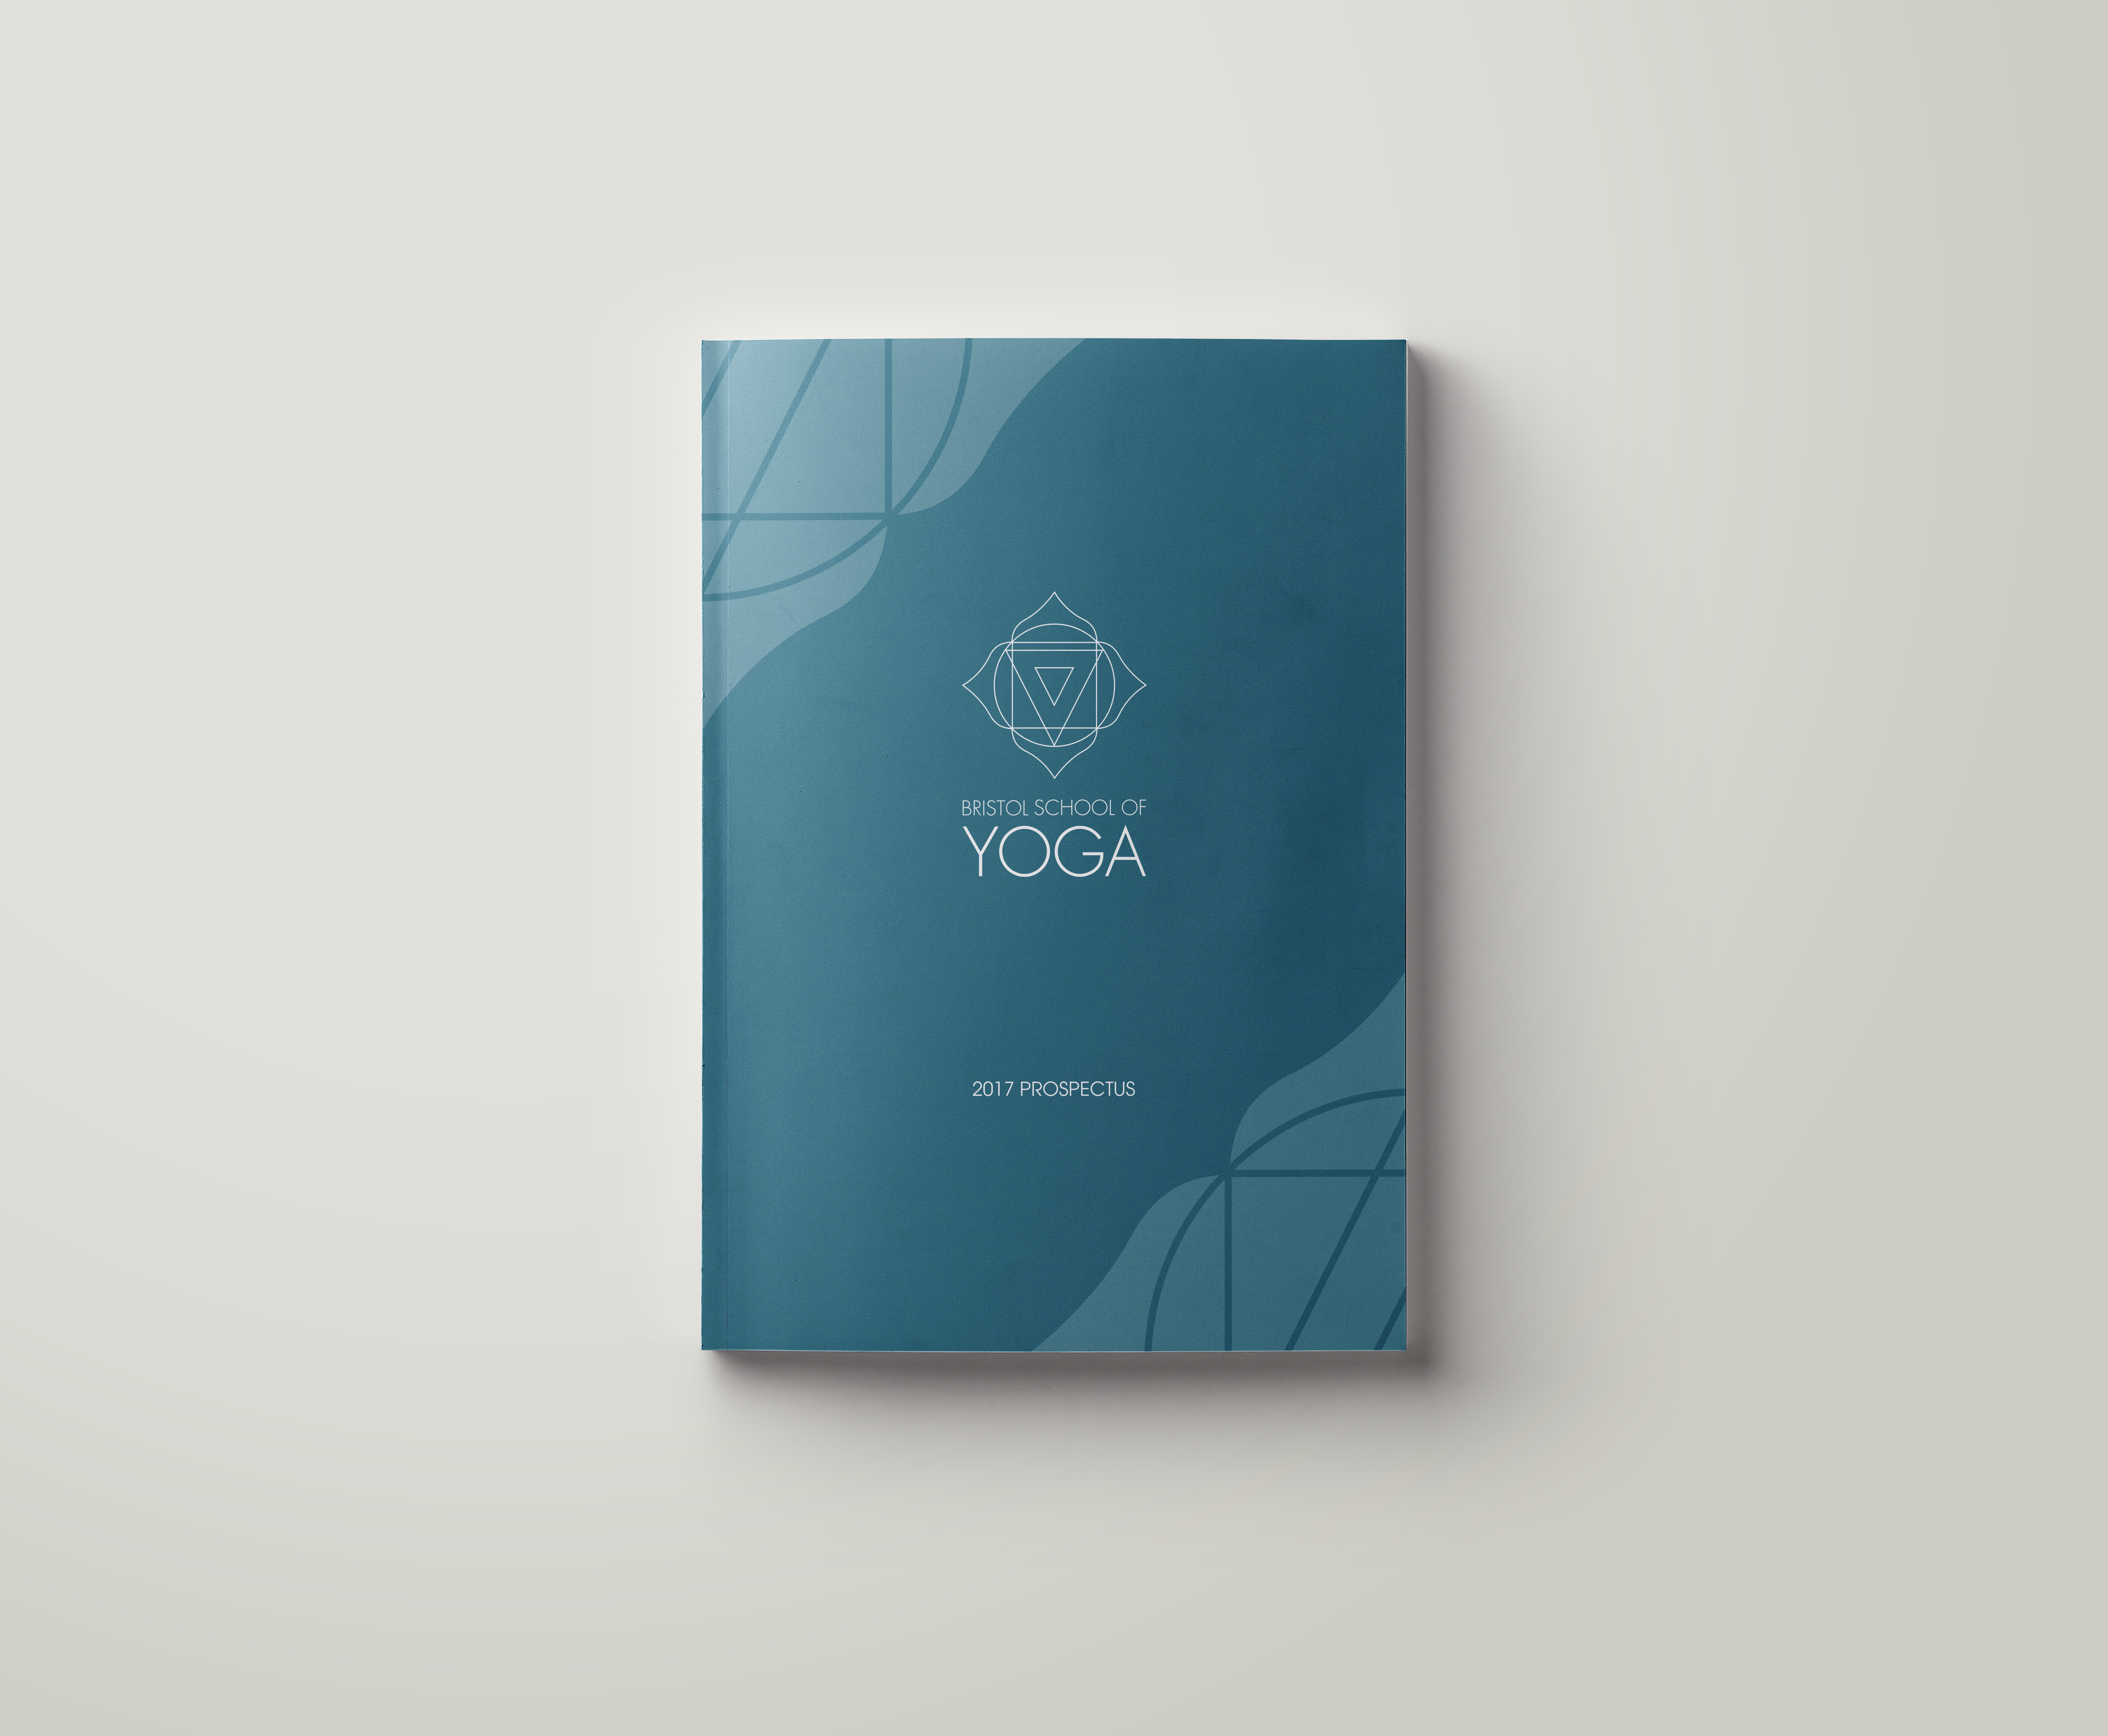 Bristol School of Yoga - Prospectus